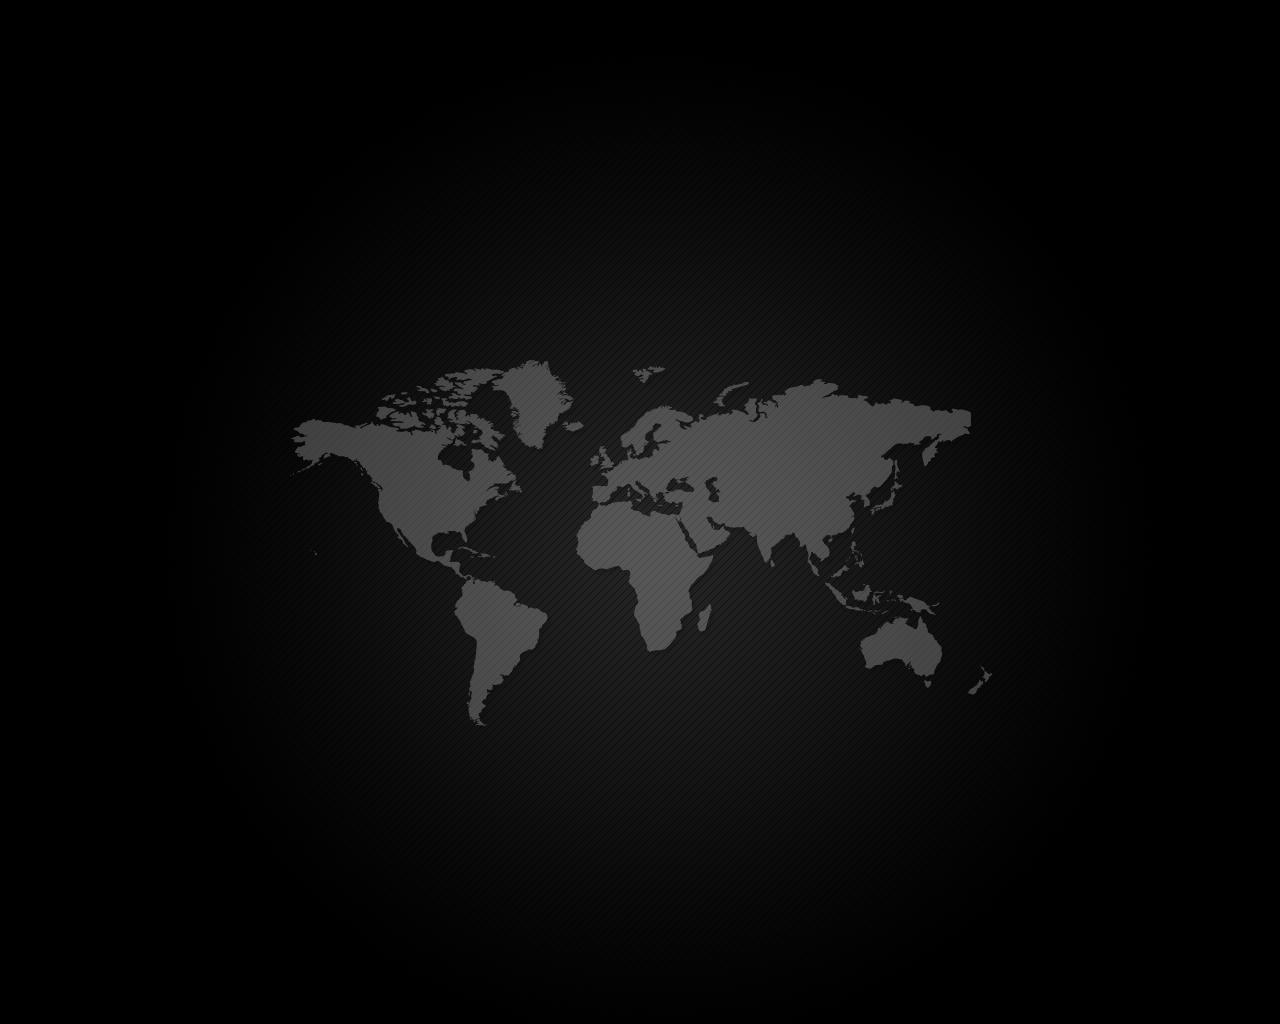 Black World Map Wallpaper 9617 Hd Wallpapers in Travel n World 1280x1024